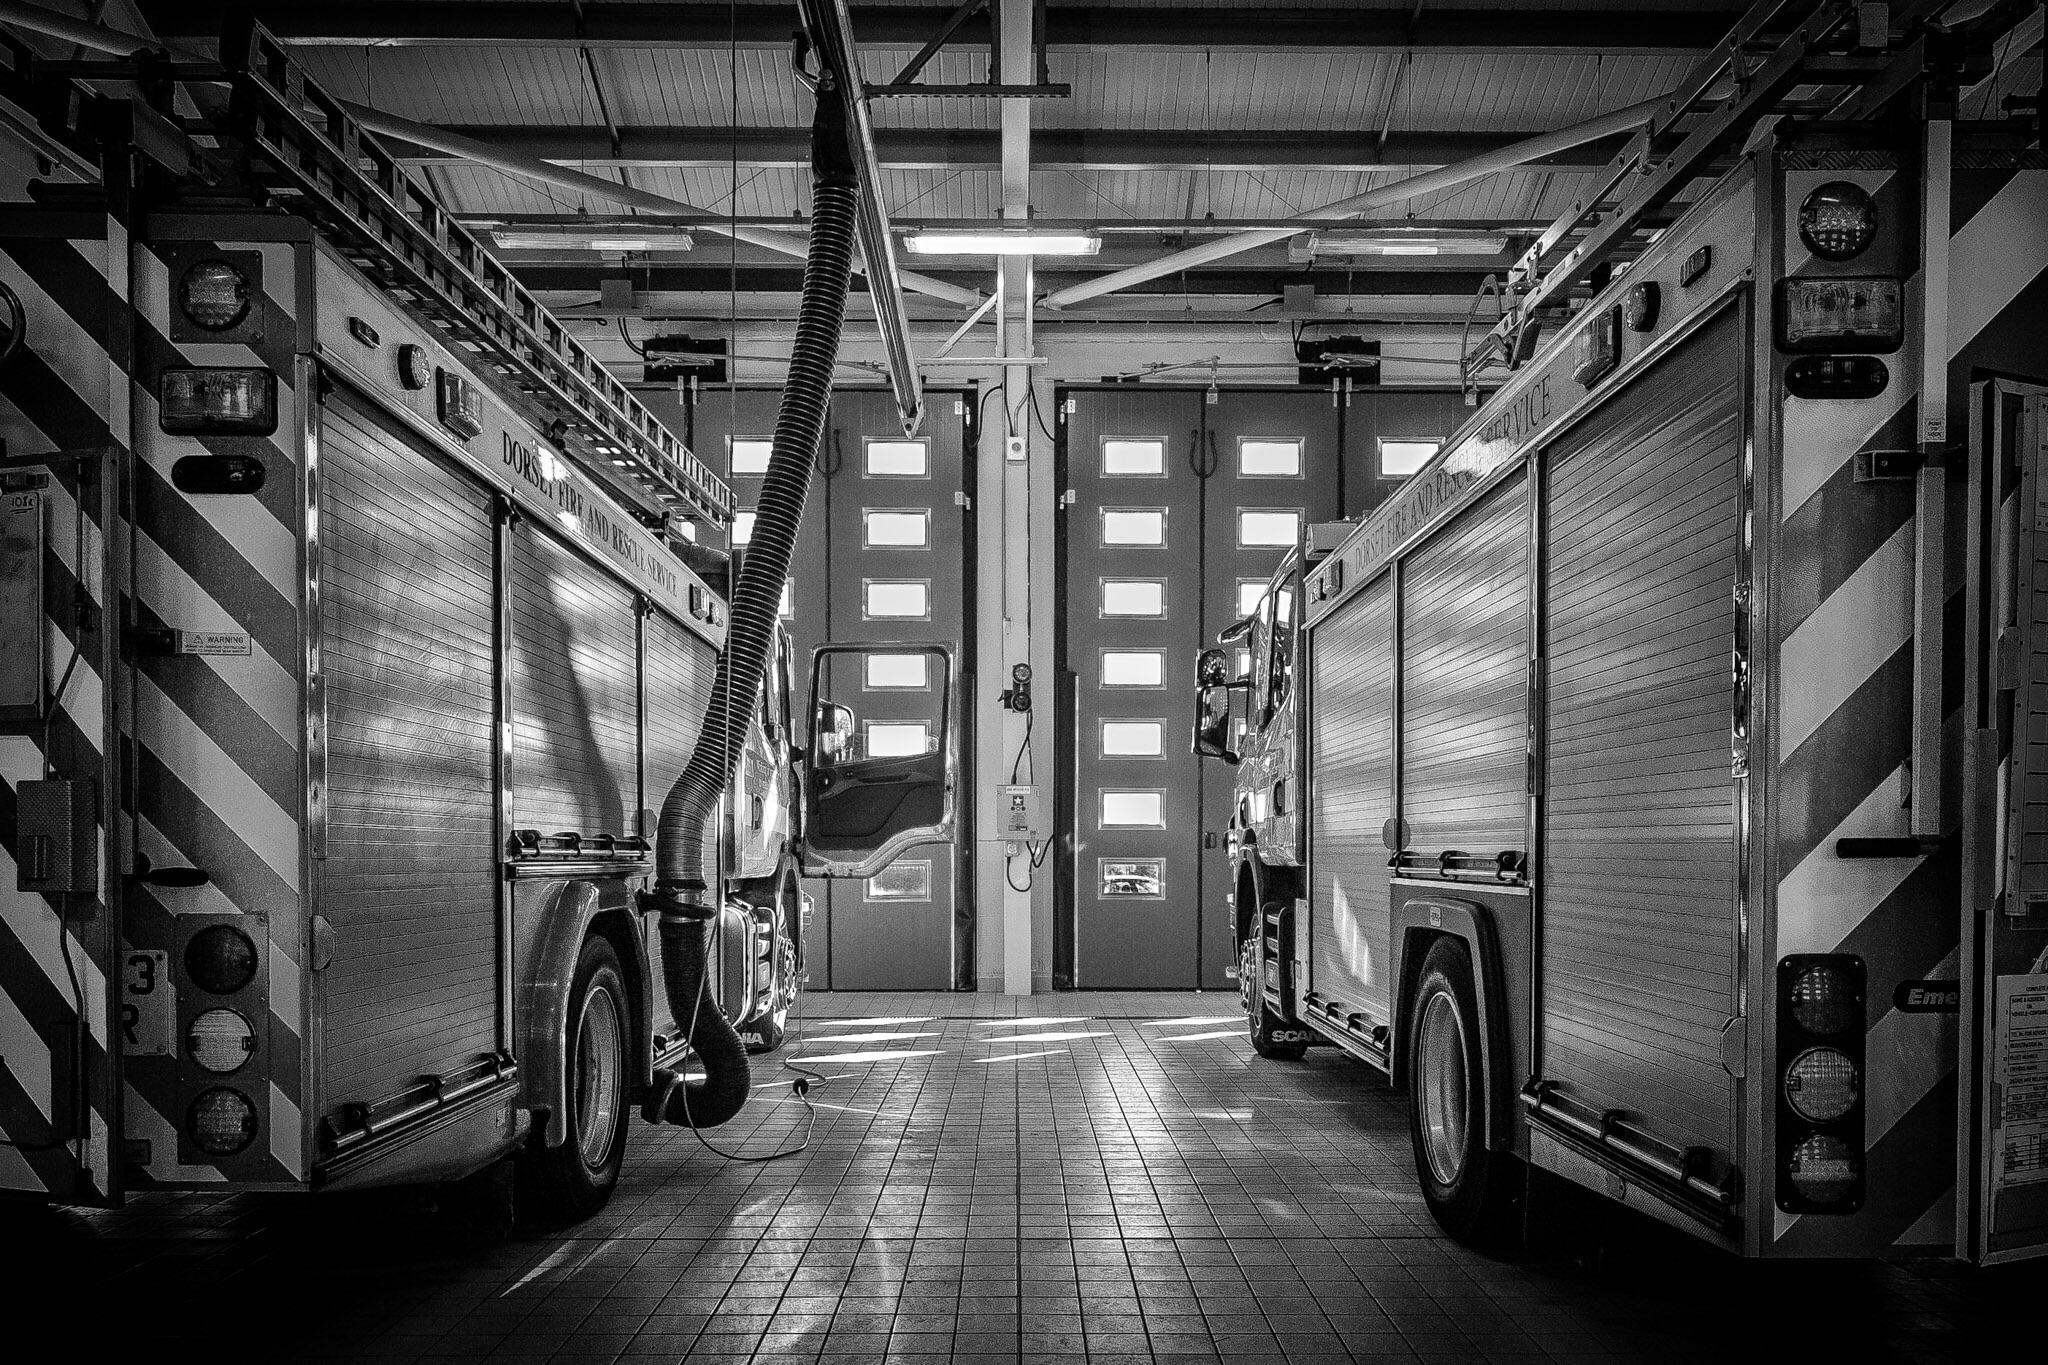 Fire appliances at Dorchester Fire Station